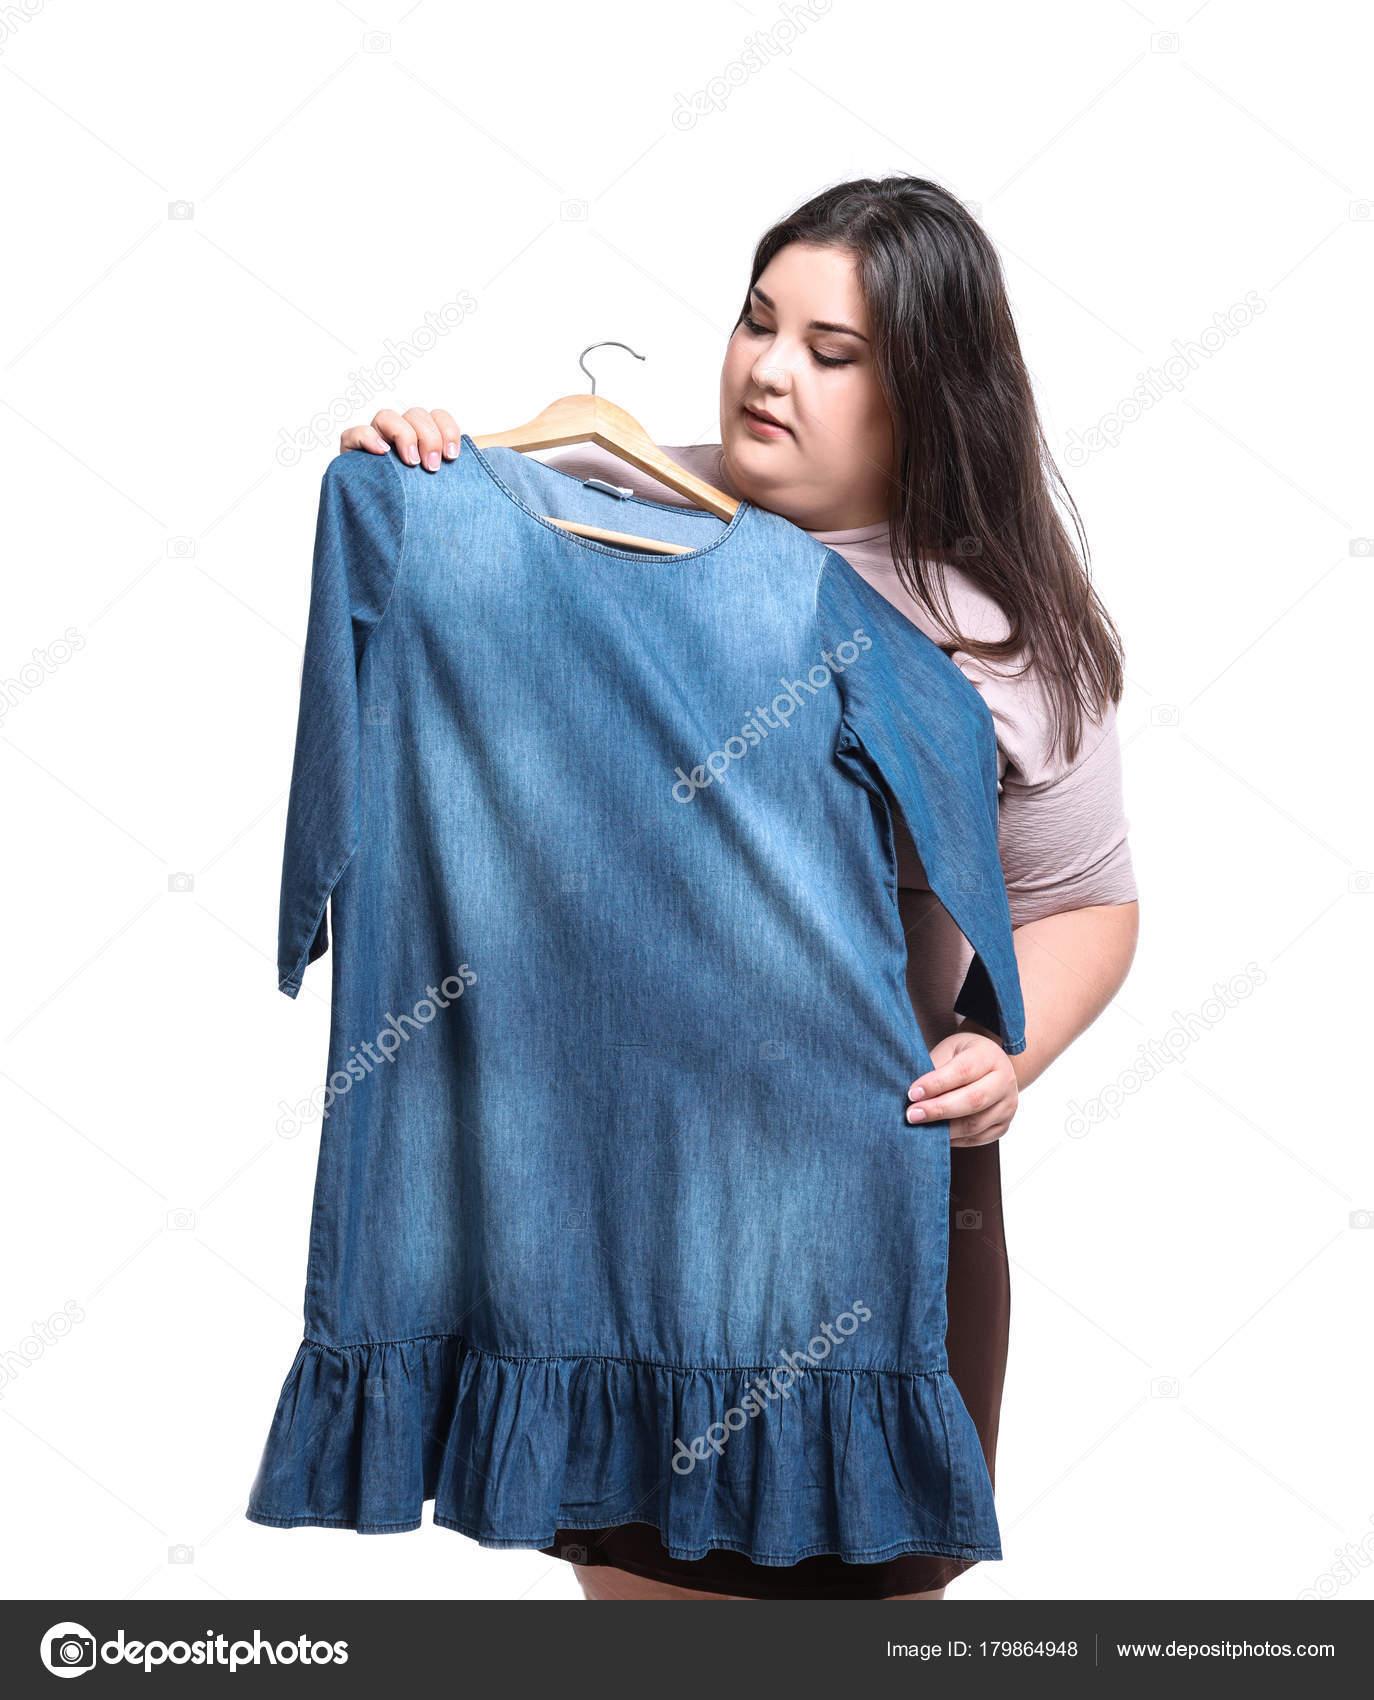 Vestidos de jeans para gordas